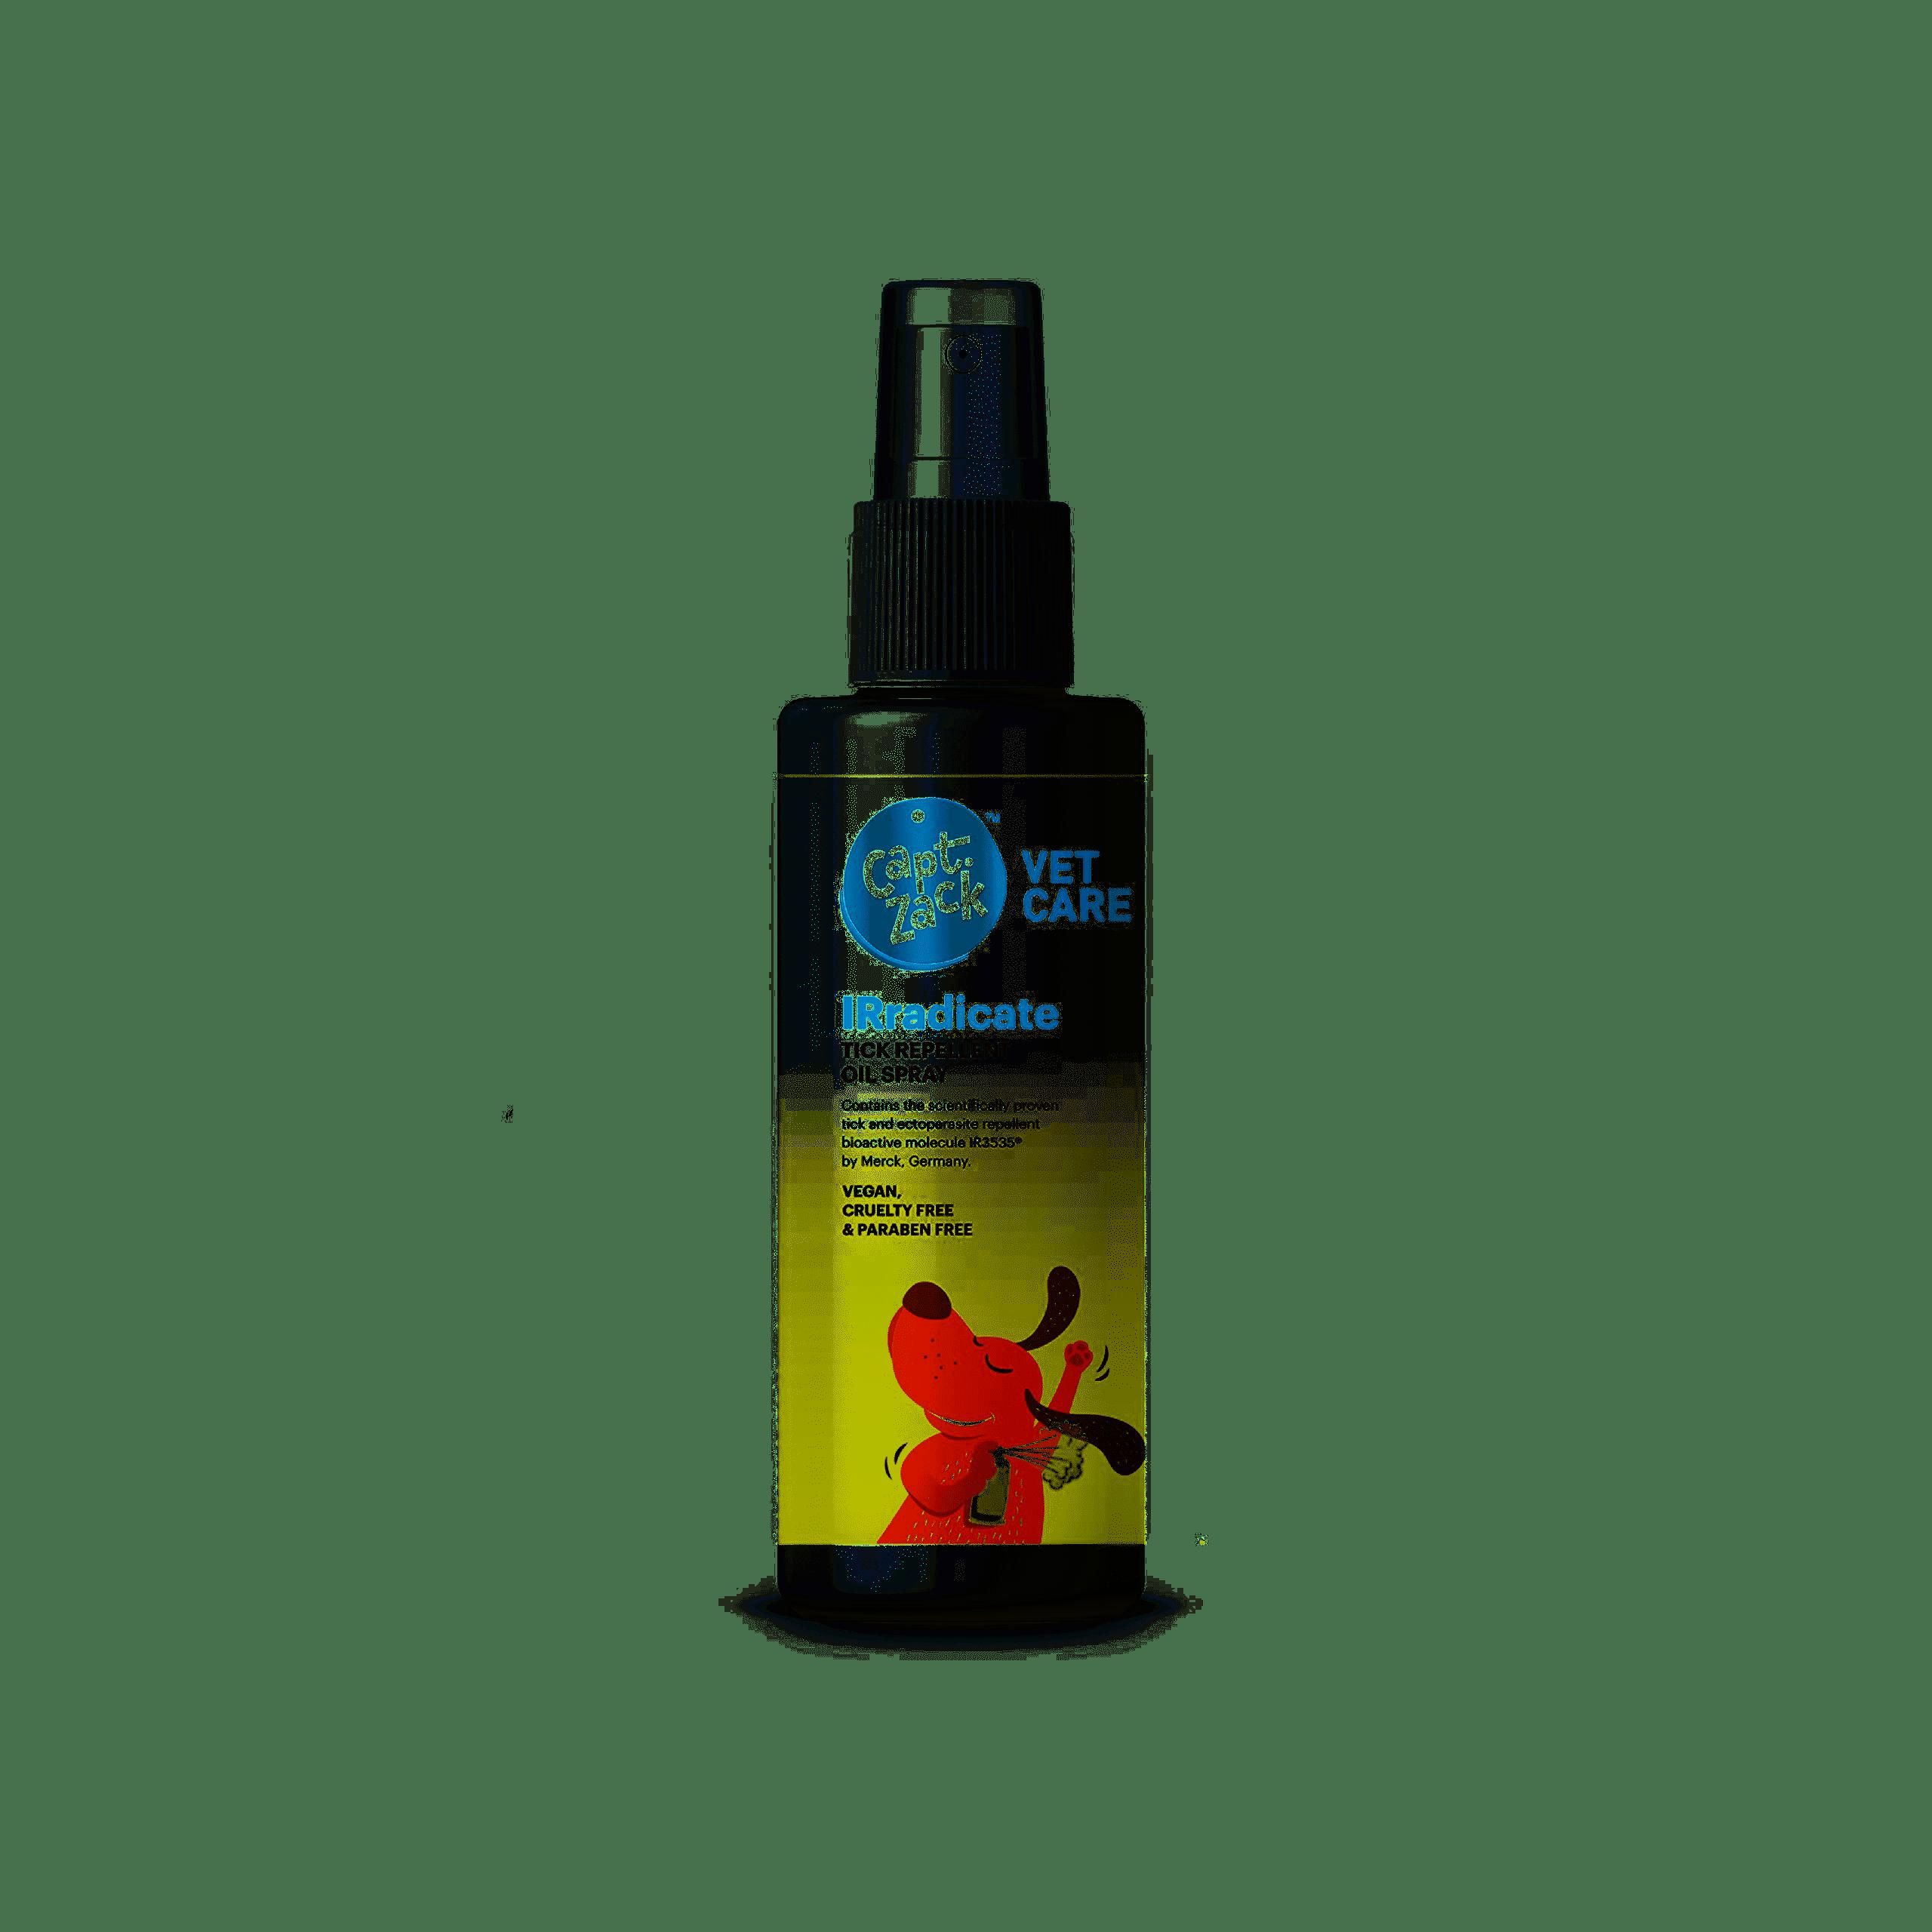 Captain Zack - IRradicate Tick Repellent Oil Spray for Ticks and Fleas (50ml)